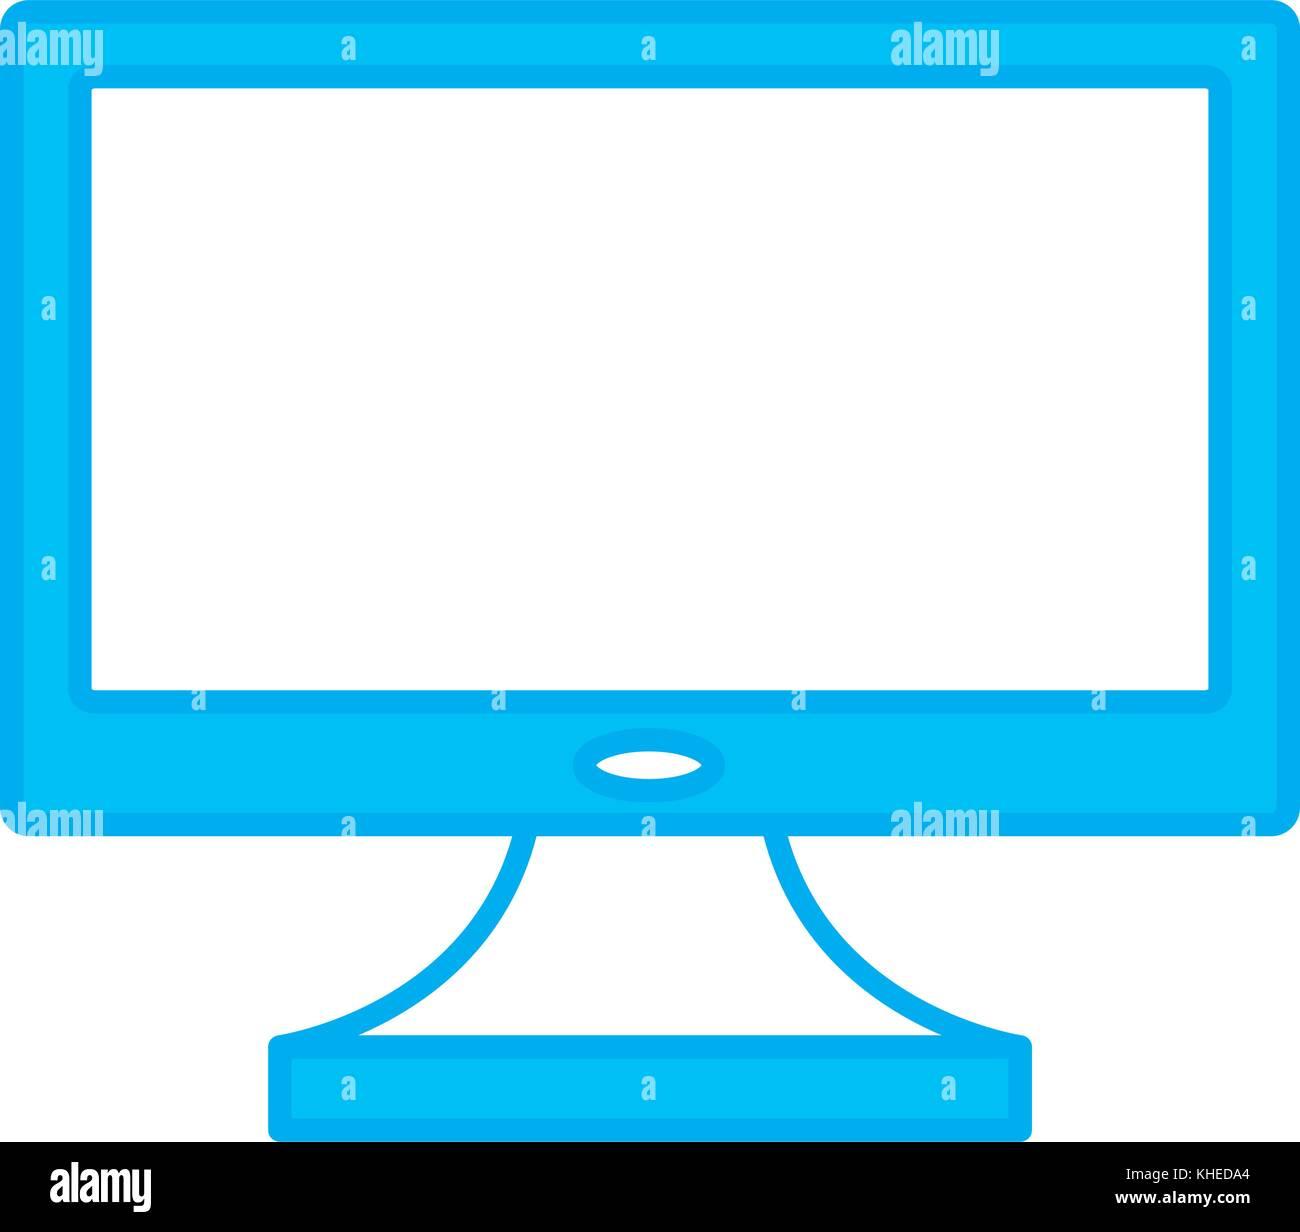 Computer monitor screen - Stock Image